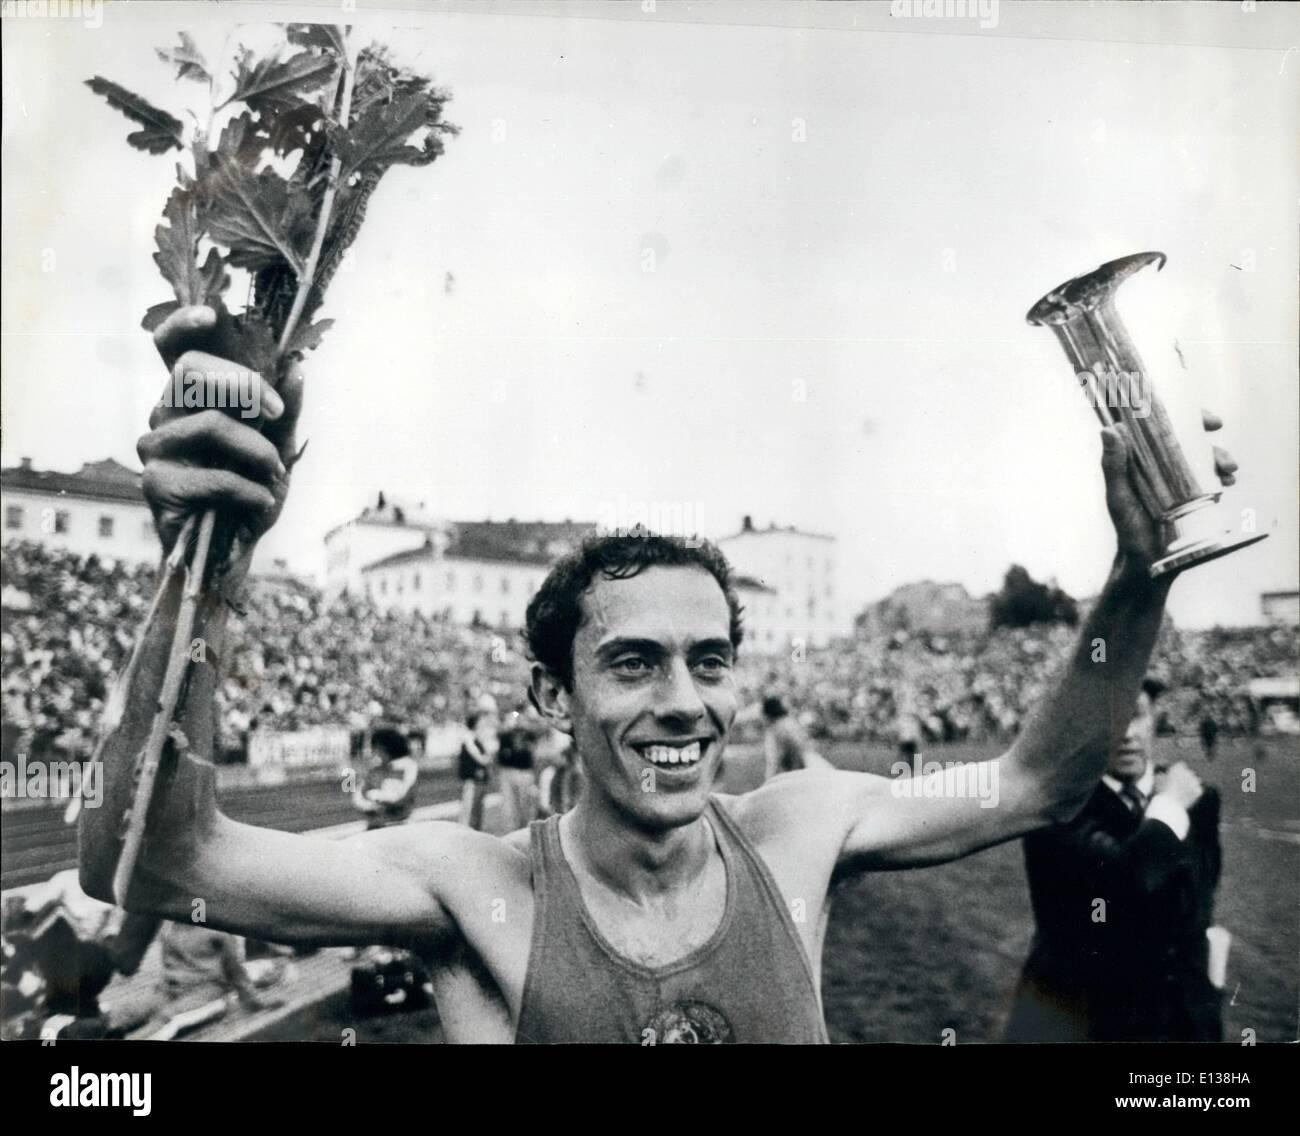 Feb. 29, 2012 - July 1980 Steve Ovett breaks world record for the mile in Oslo – In the Bislett Stadium in Stock Photo